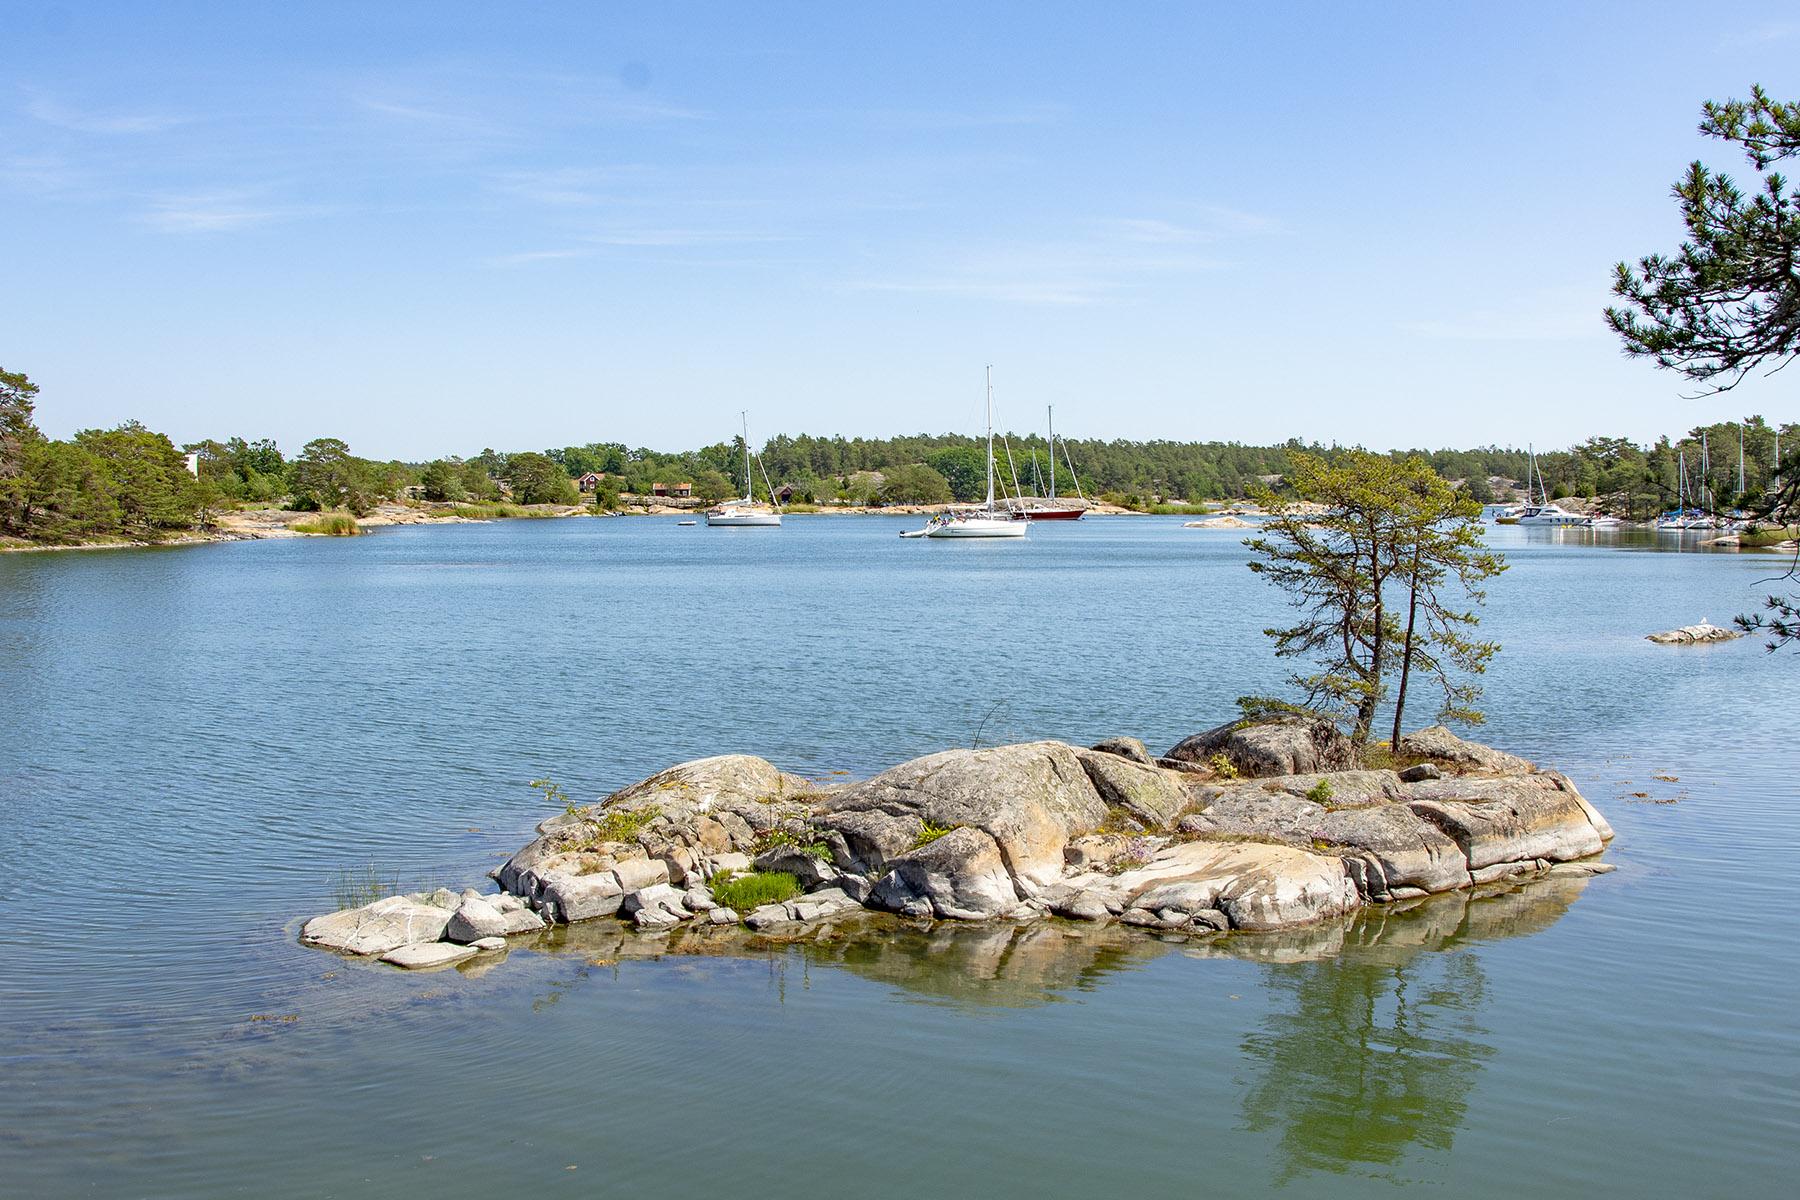 Stora Krokholmen